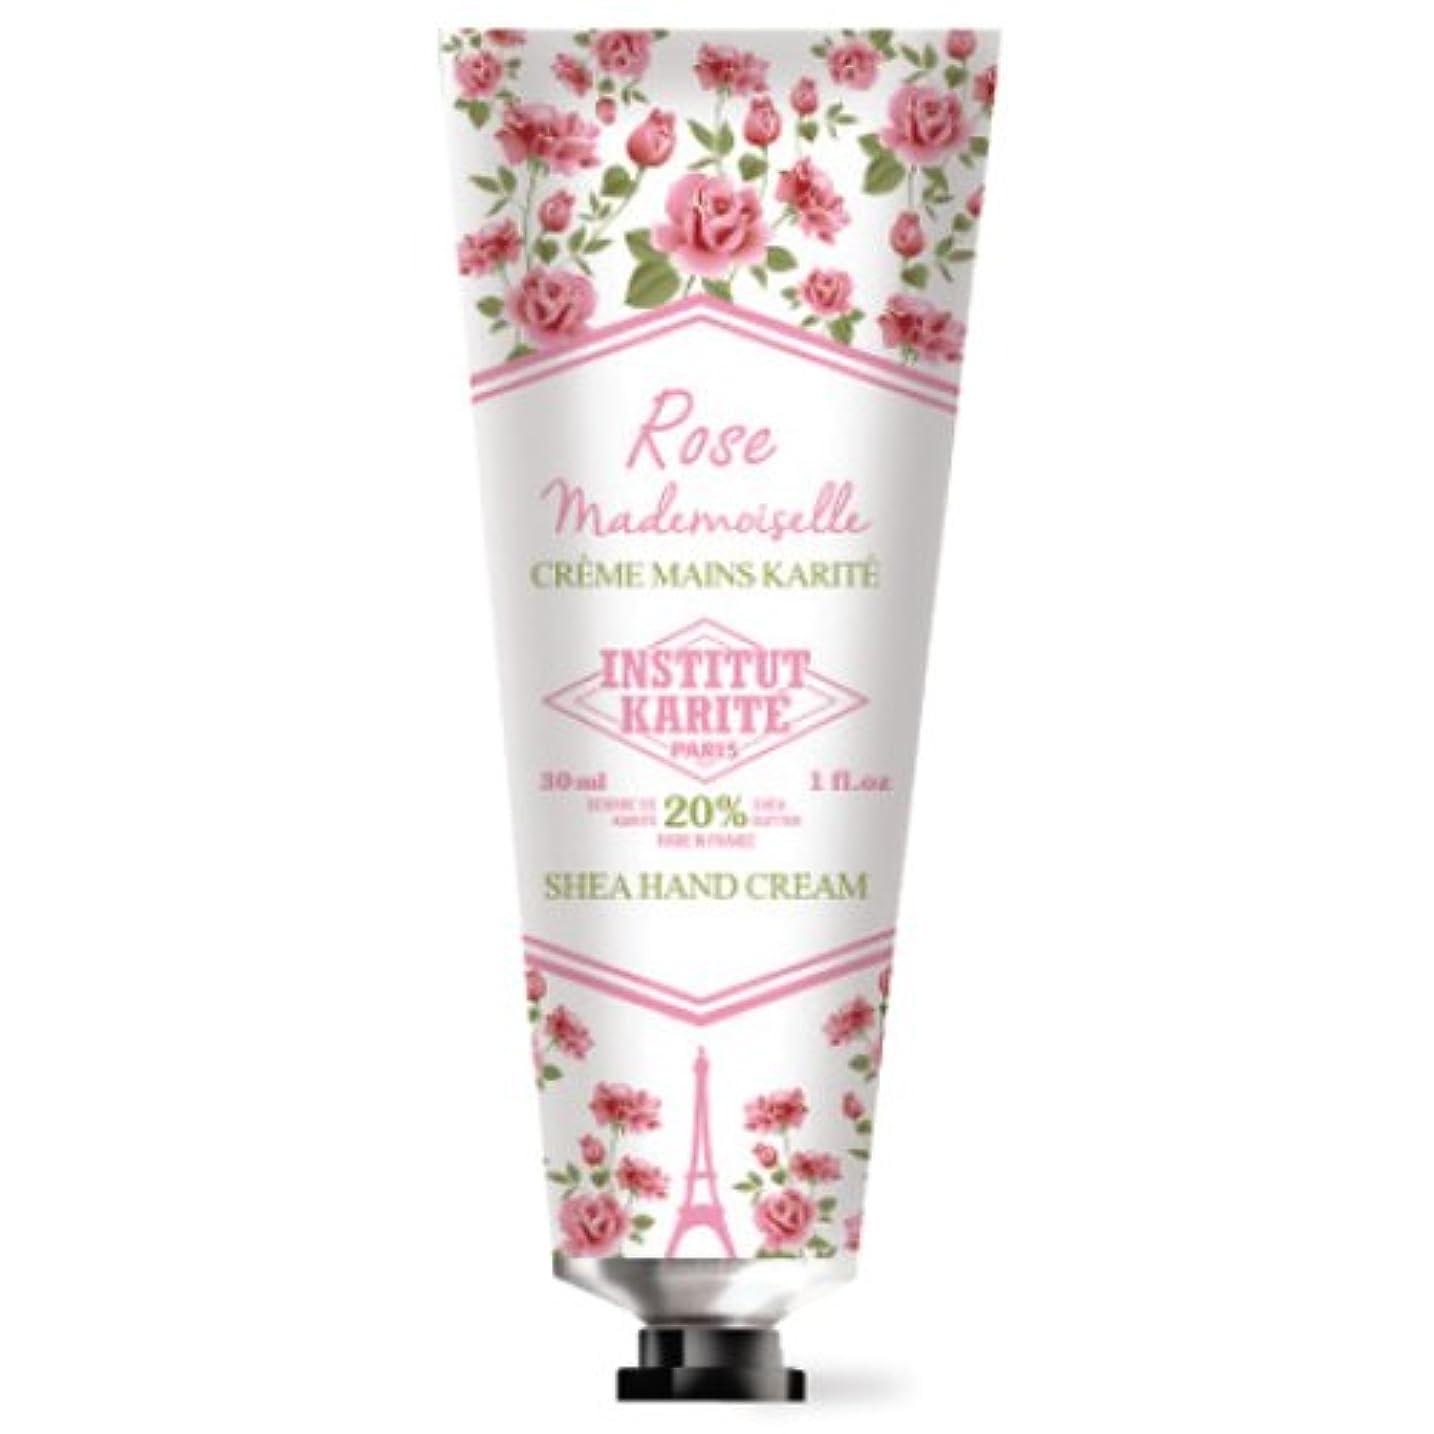 INSTITUT KARITE カリテ Rose Mademoiselle クラシックローズ ハンドクリーム 30ml